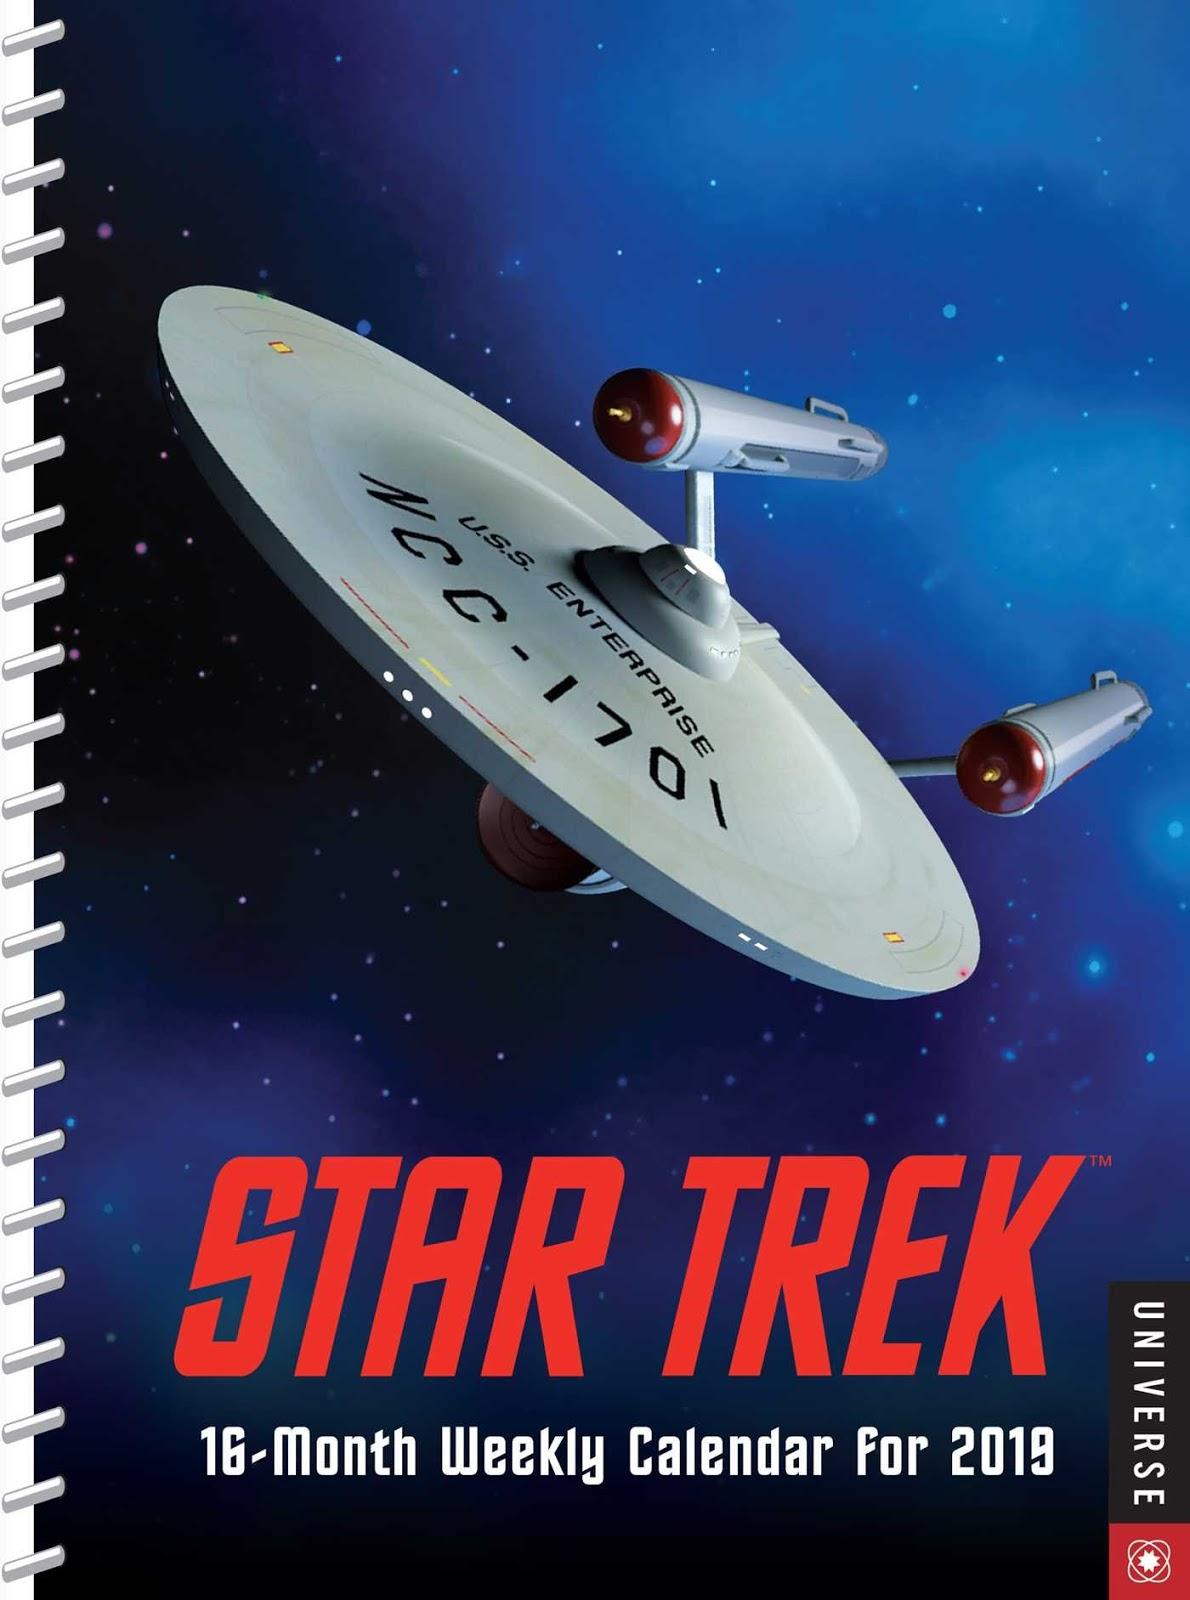 Star Trek 16 Month Stardate 2019 Executive Engagement Weekly